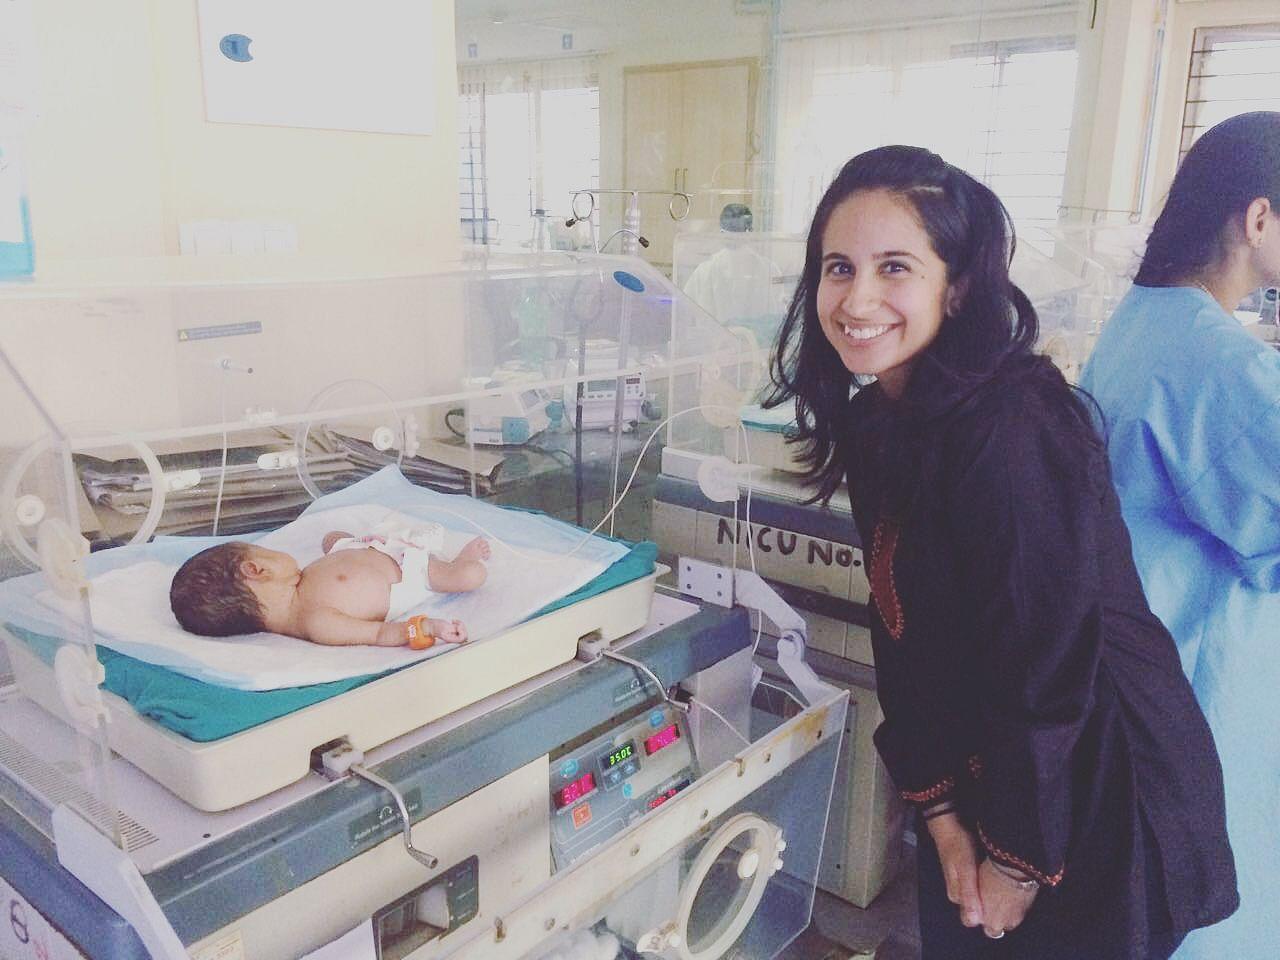 Janan putting a Bempu bracelent on a newborn.